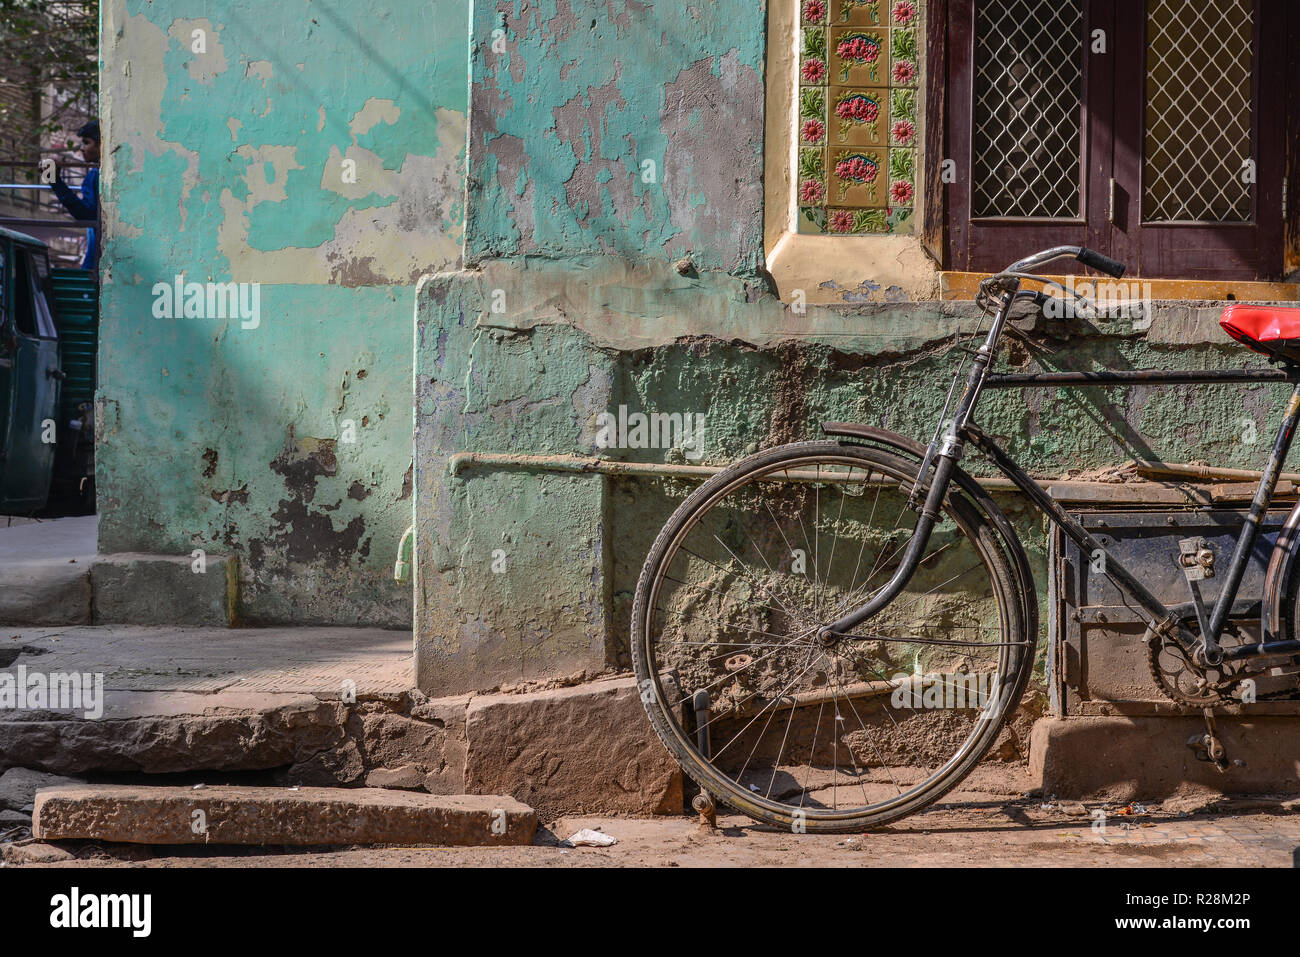 Old retro bicycle on vintage street in Jodhpur, India Stock Photo